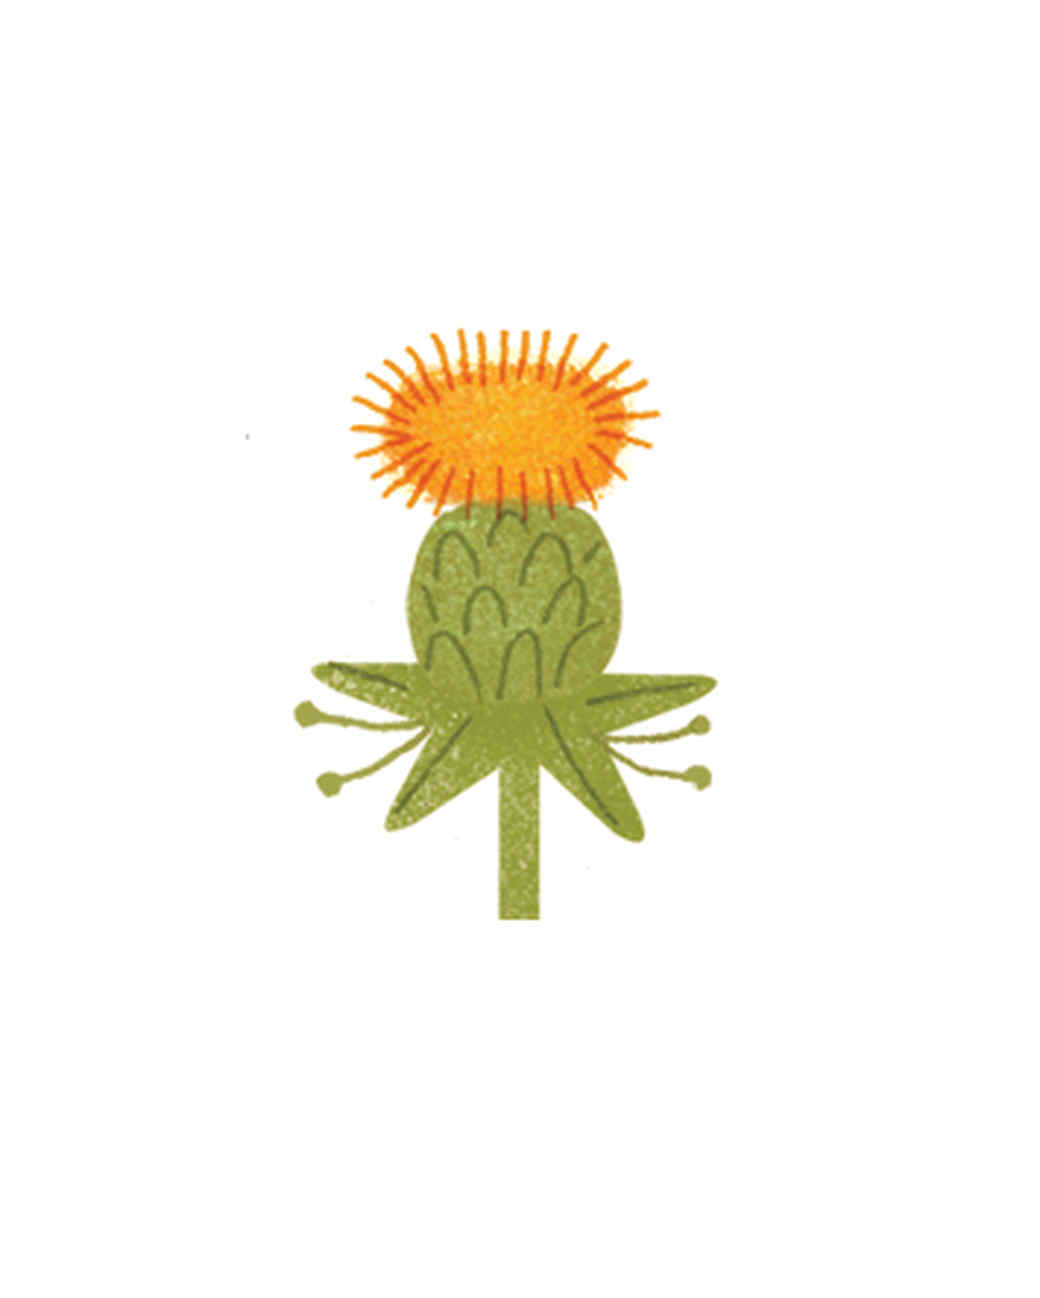 essential-oils-illustration-16.jpg